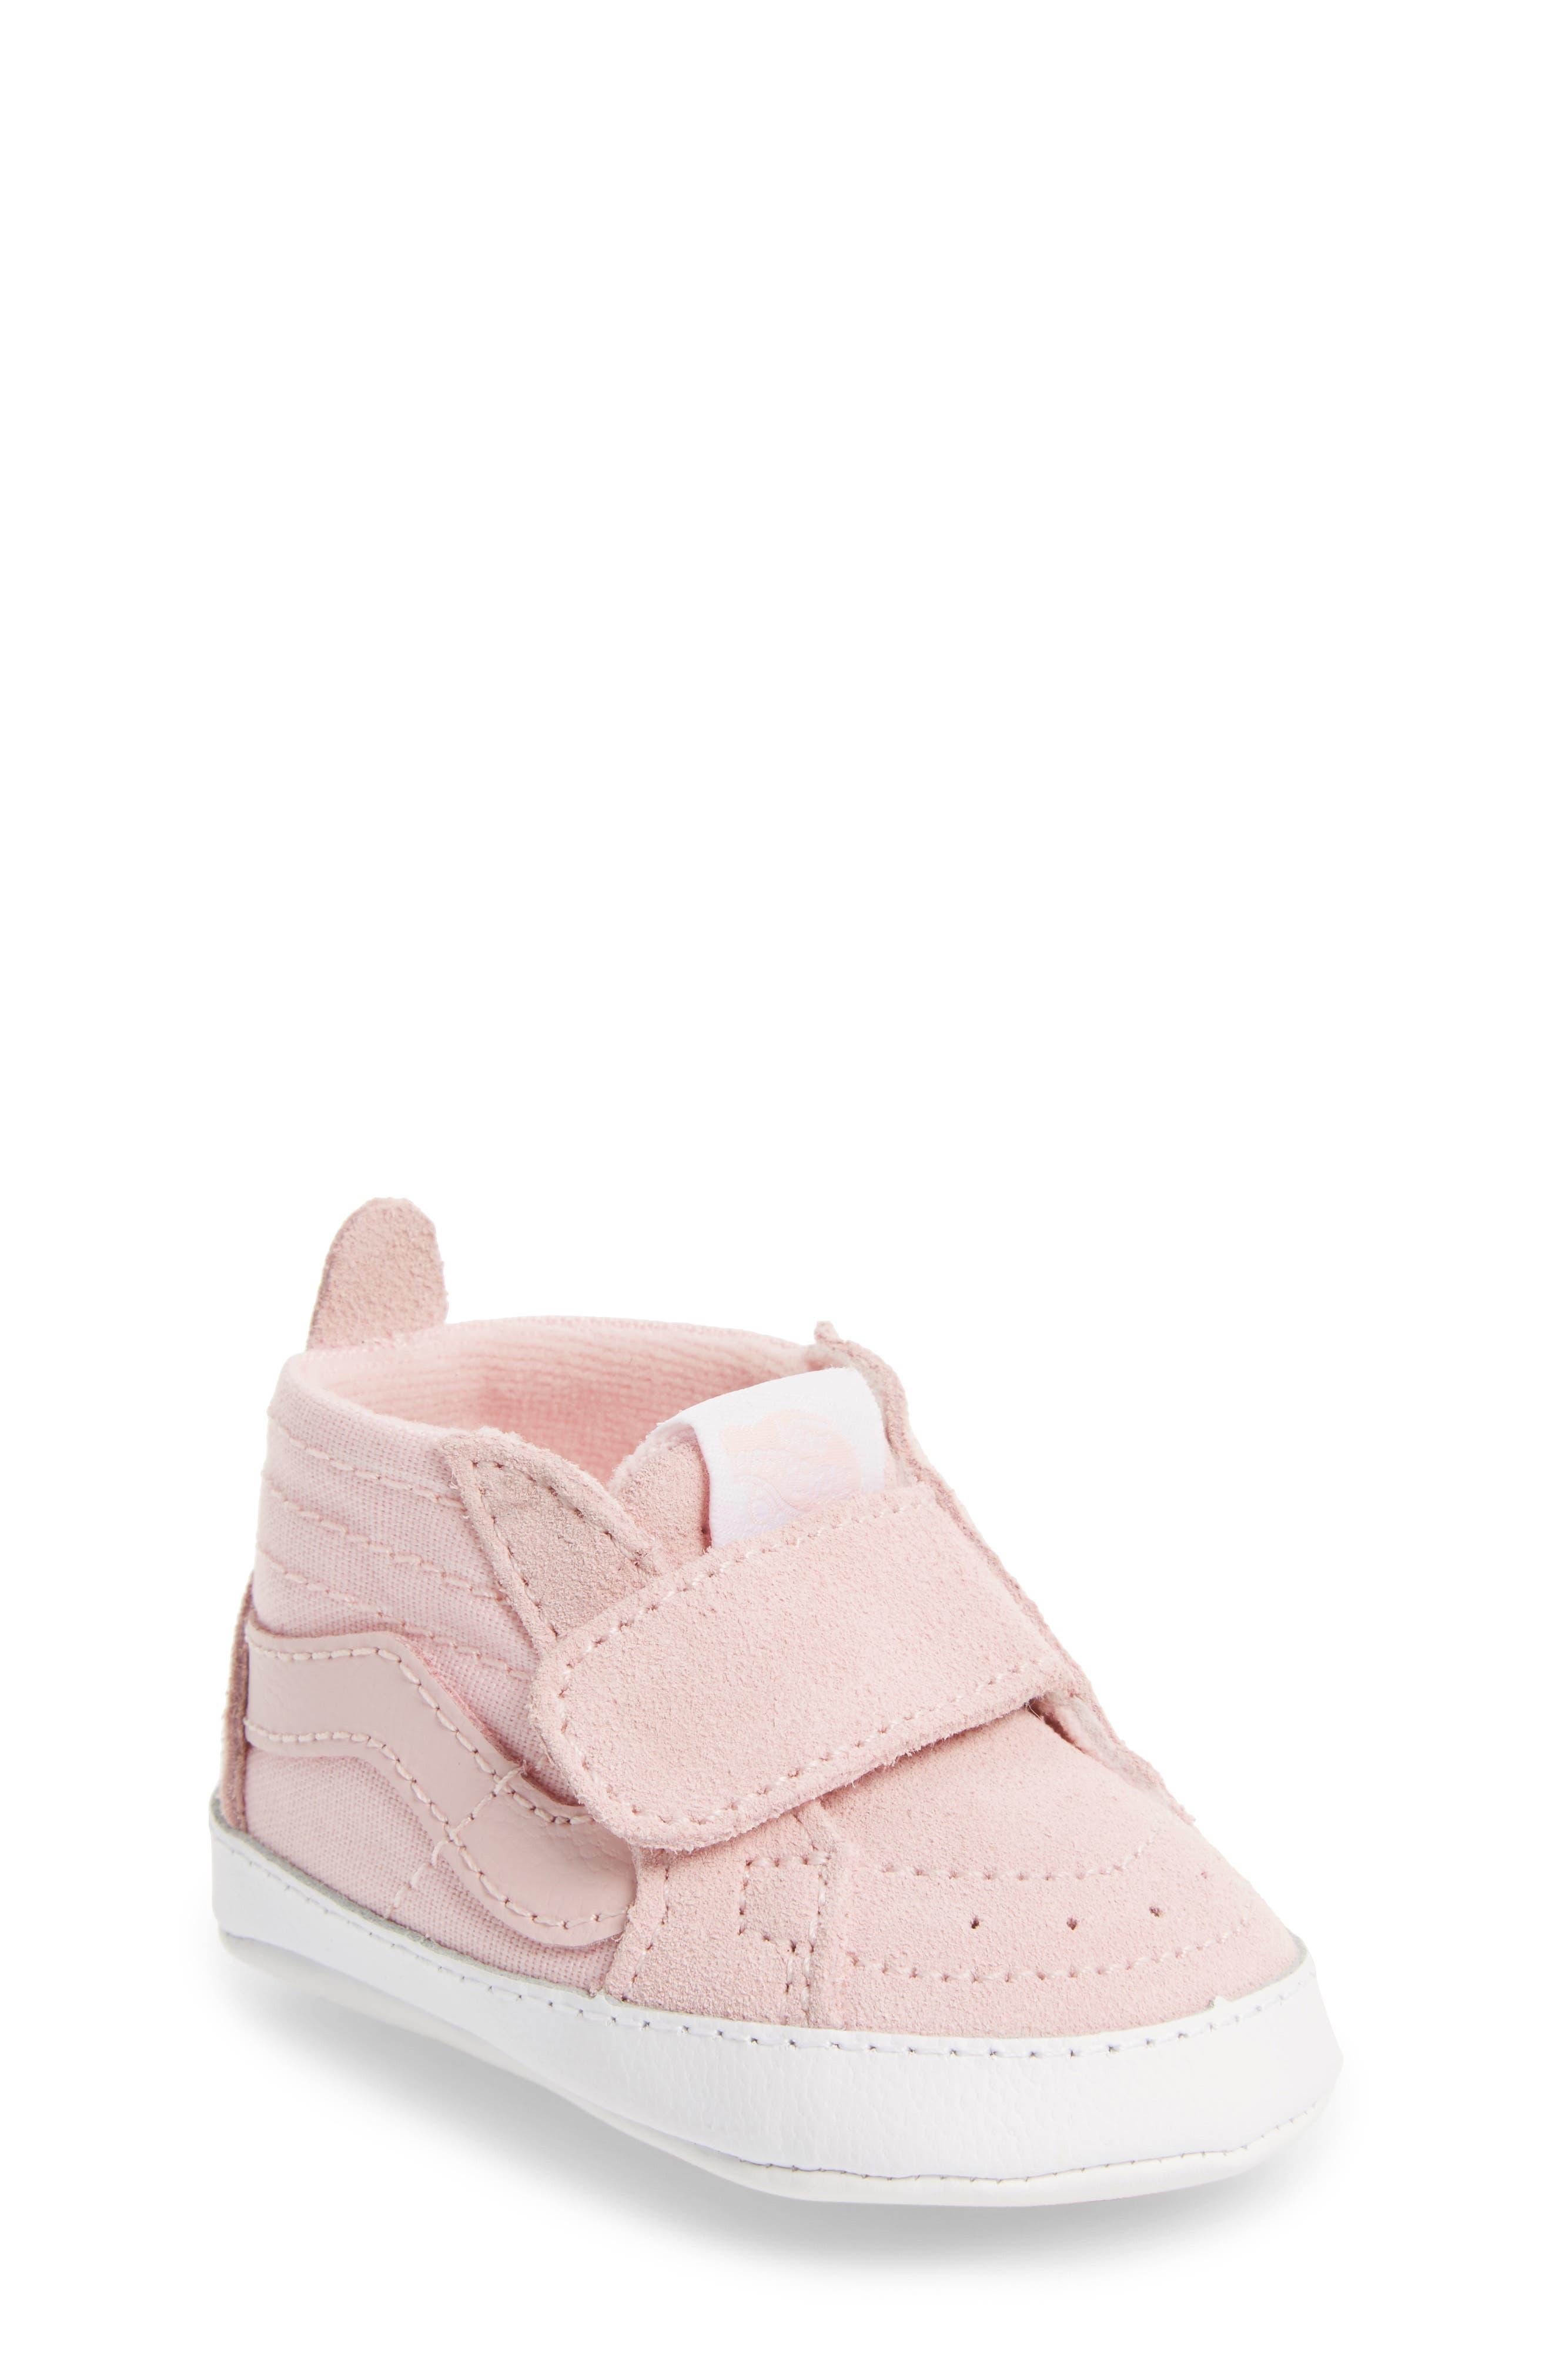 SK8-Hi Crib Sneaker,                             Main thumbnail 1, color,